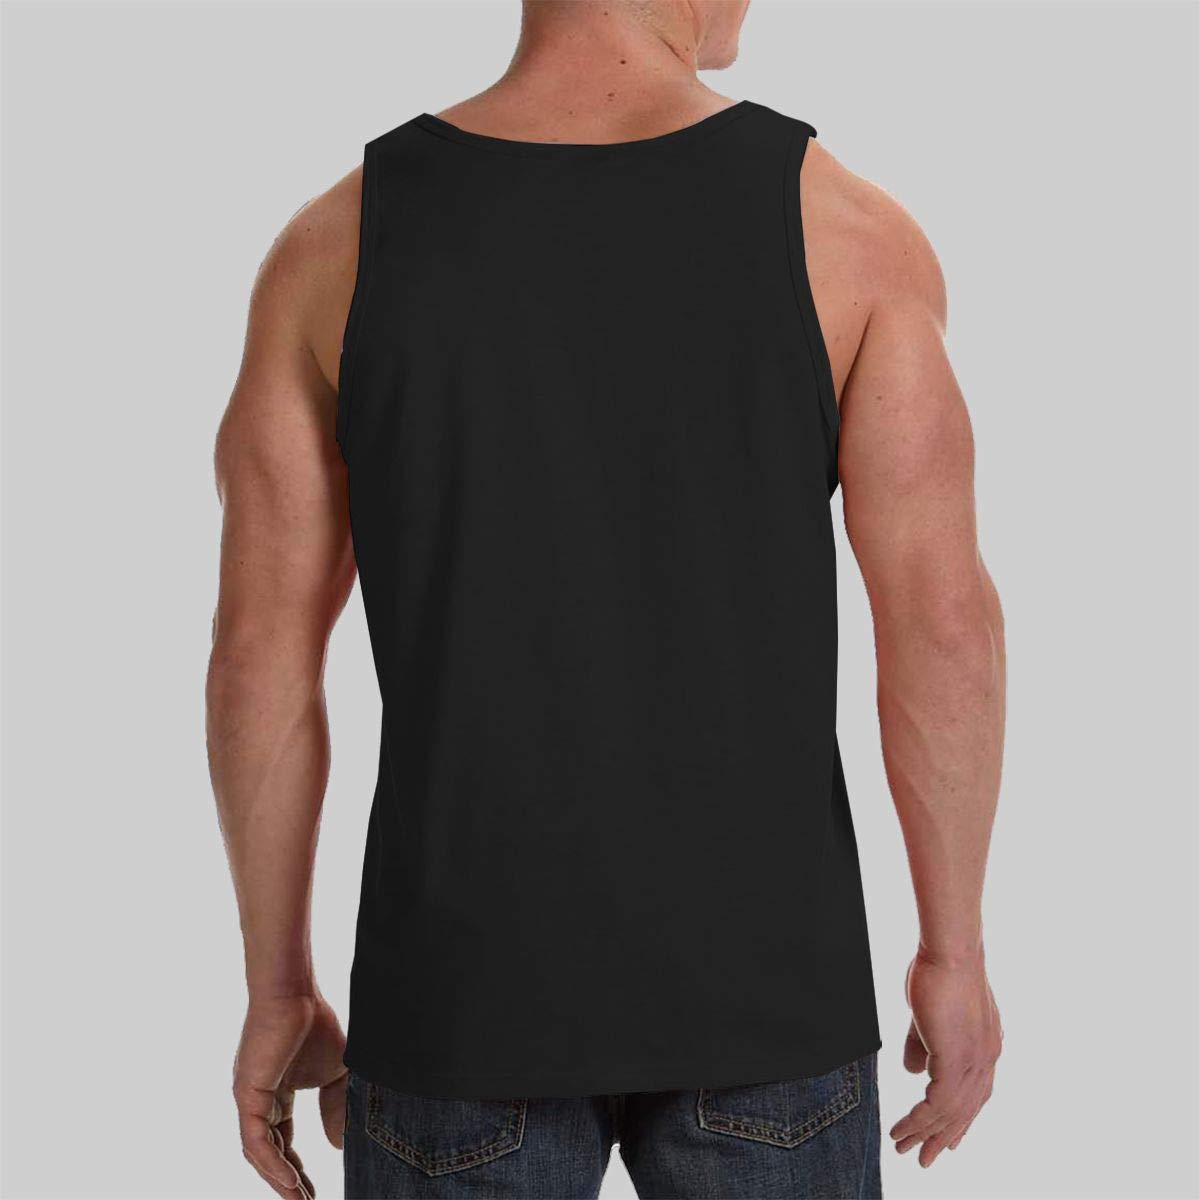 Joyce-life Hibiscus Rosa-sinensis Flower Mens Tank Top Slim Fit Muscle Shirt Black